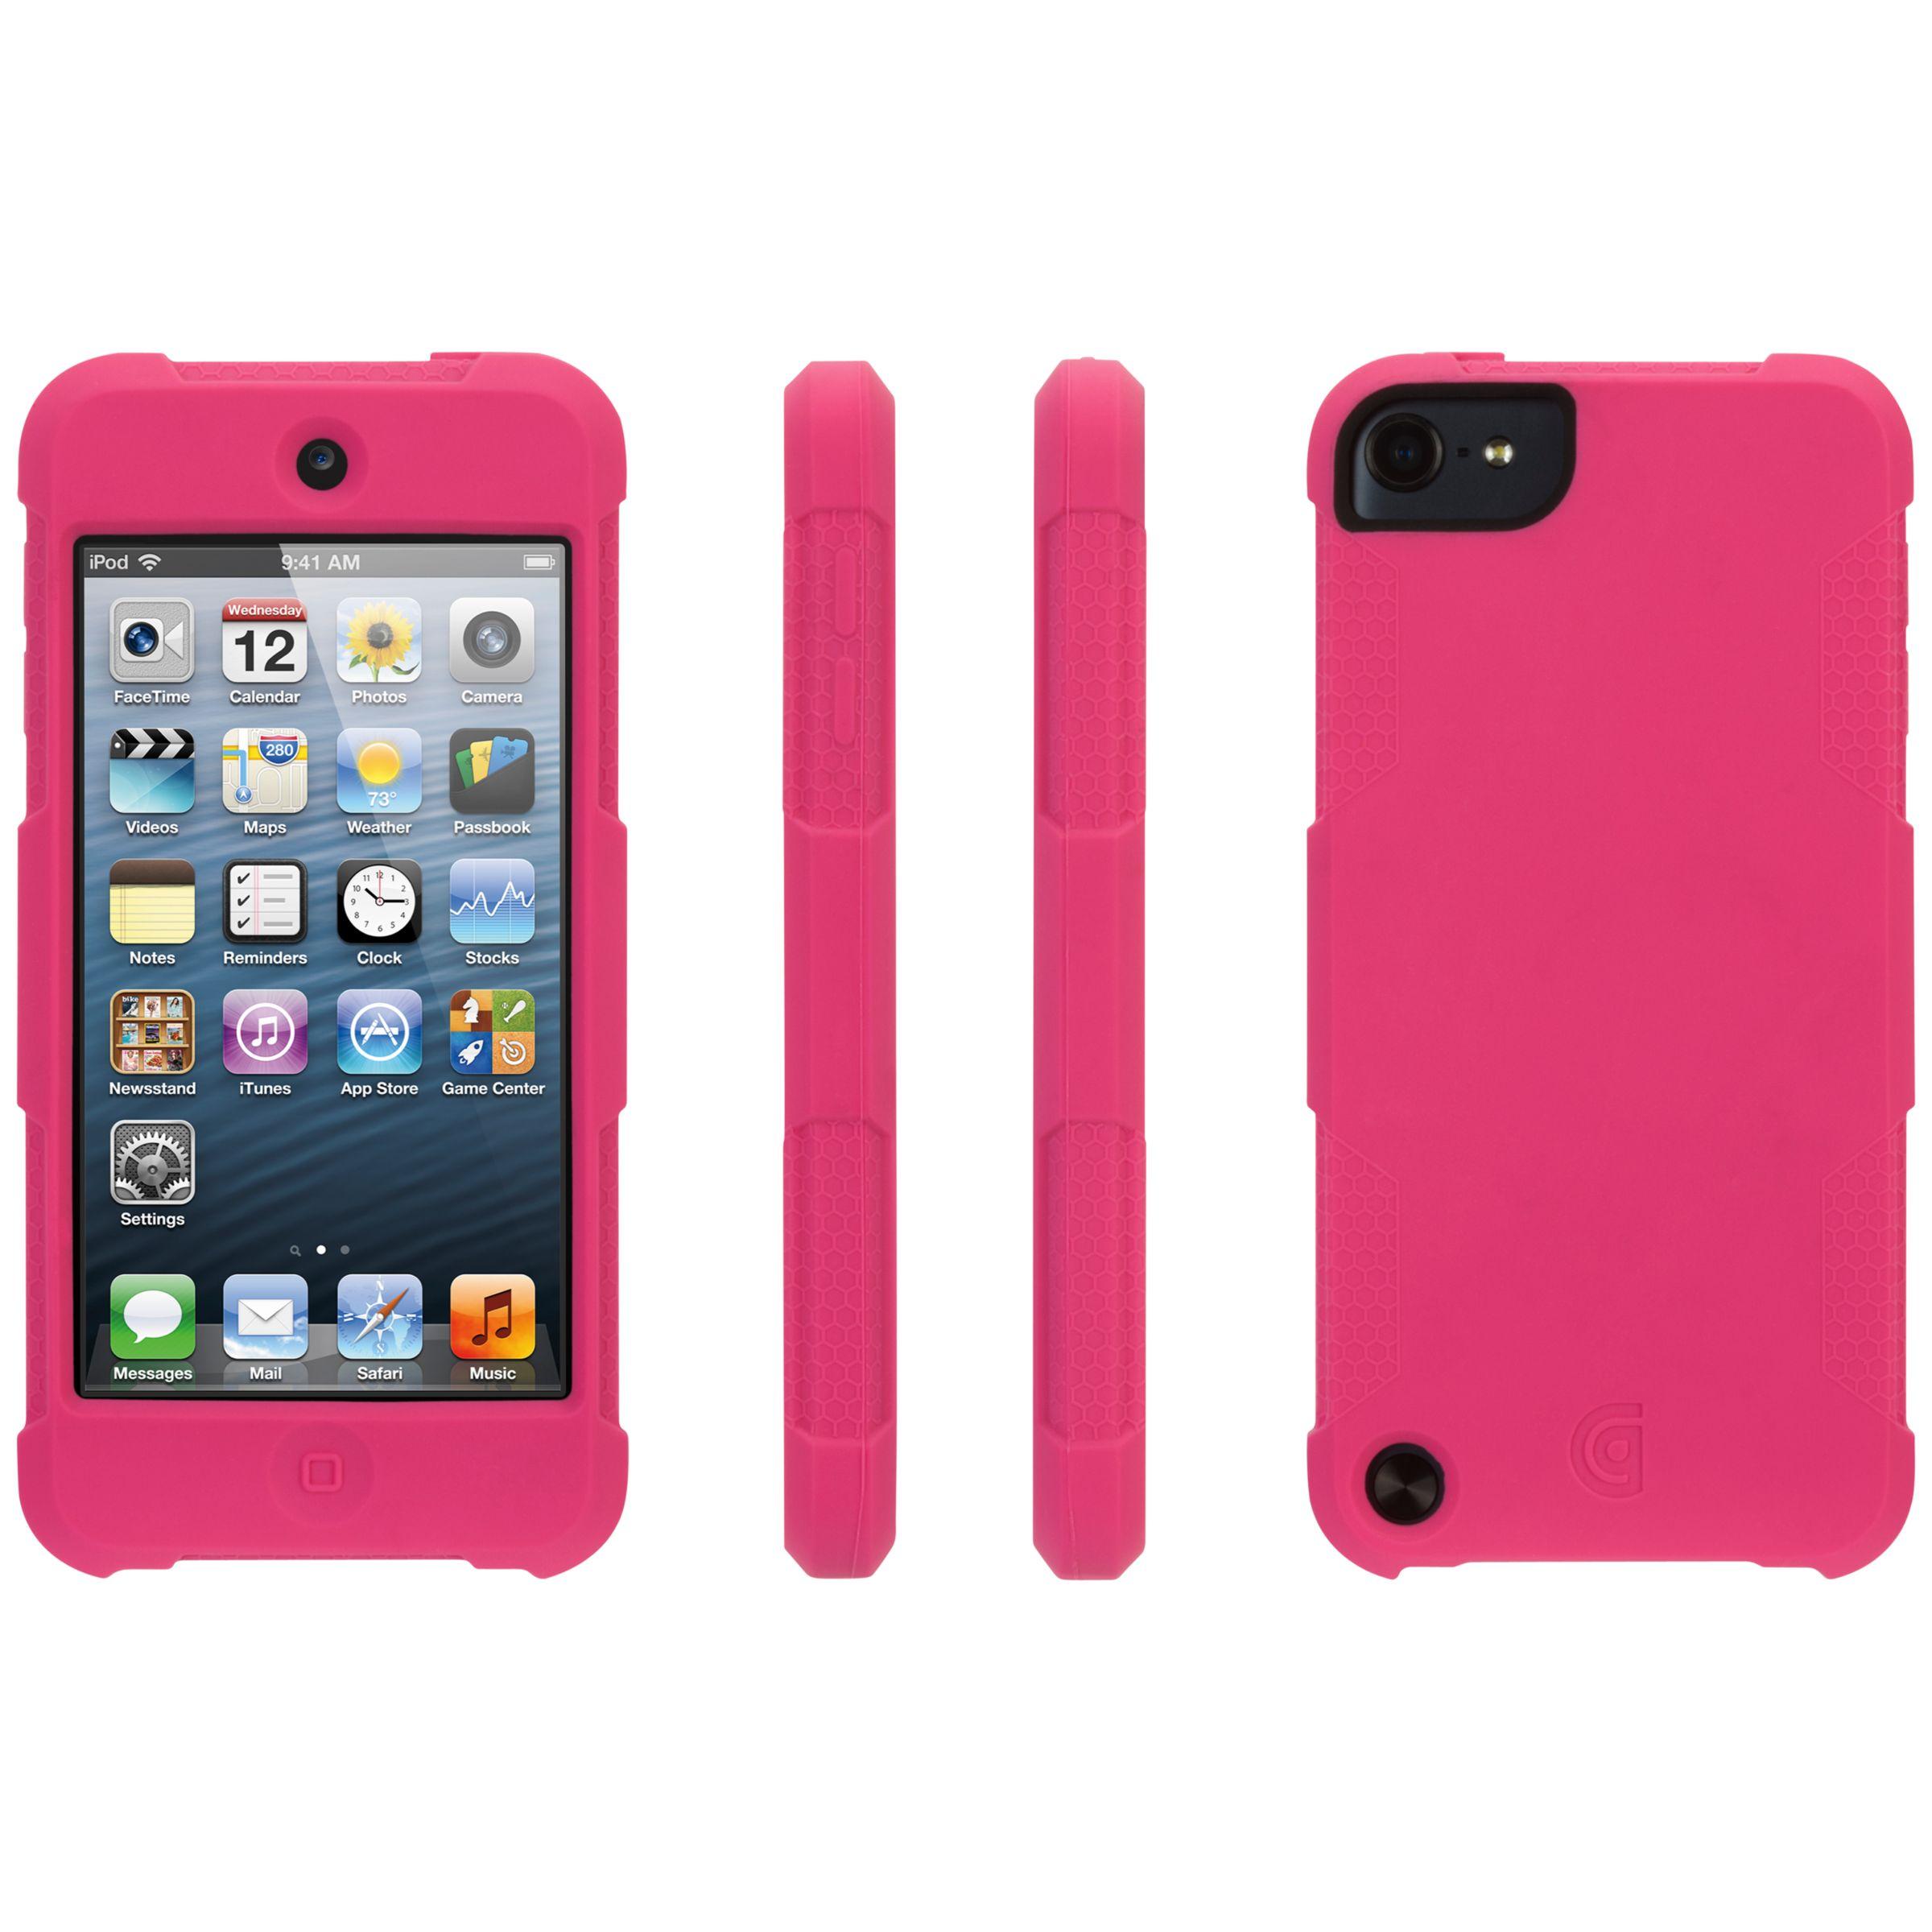 Griffin Griffin Survivor Skin Case for iPod Touch 5th Generation